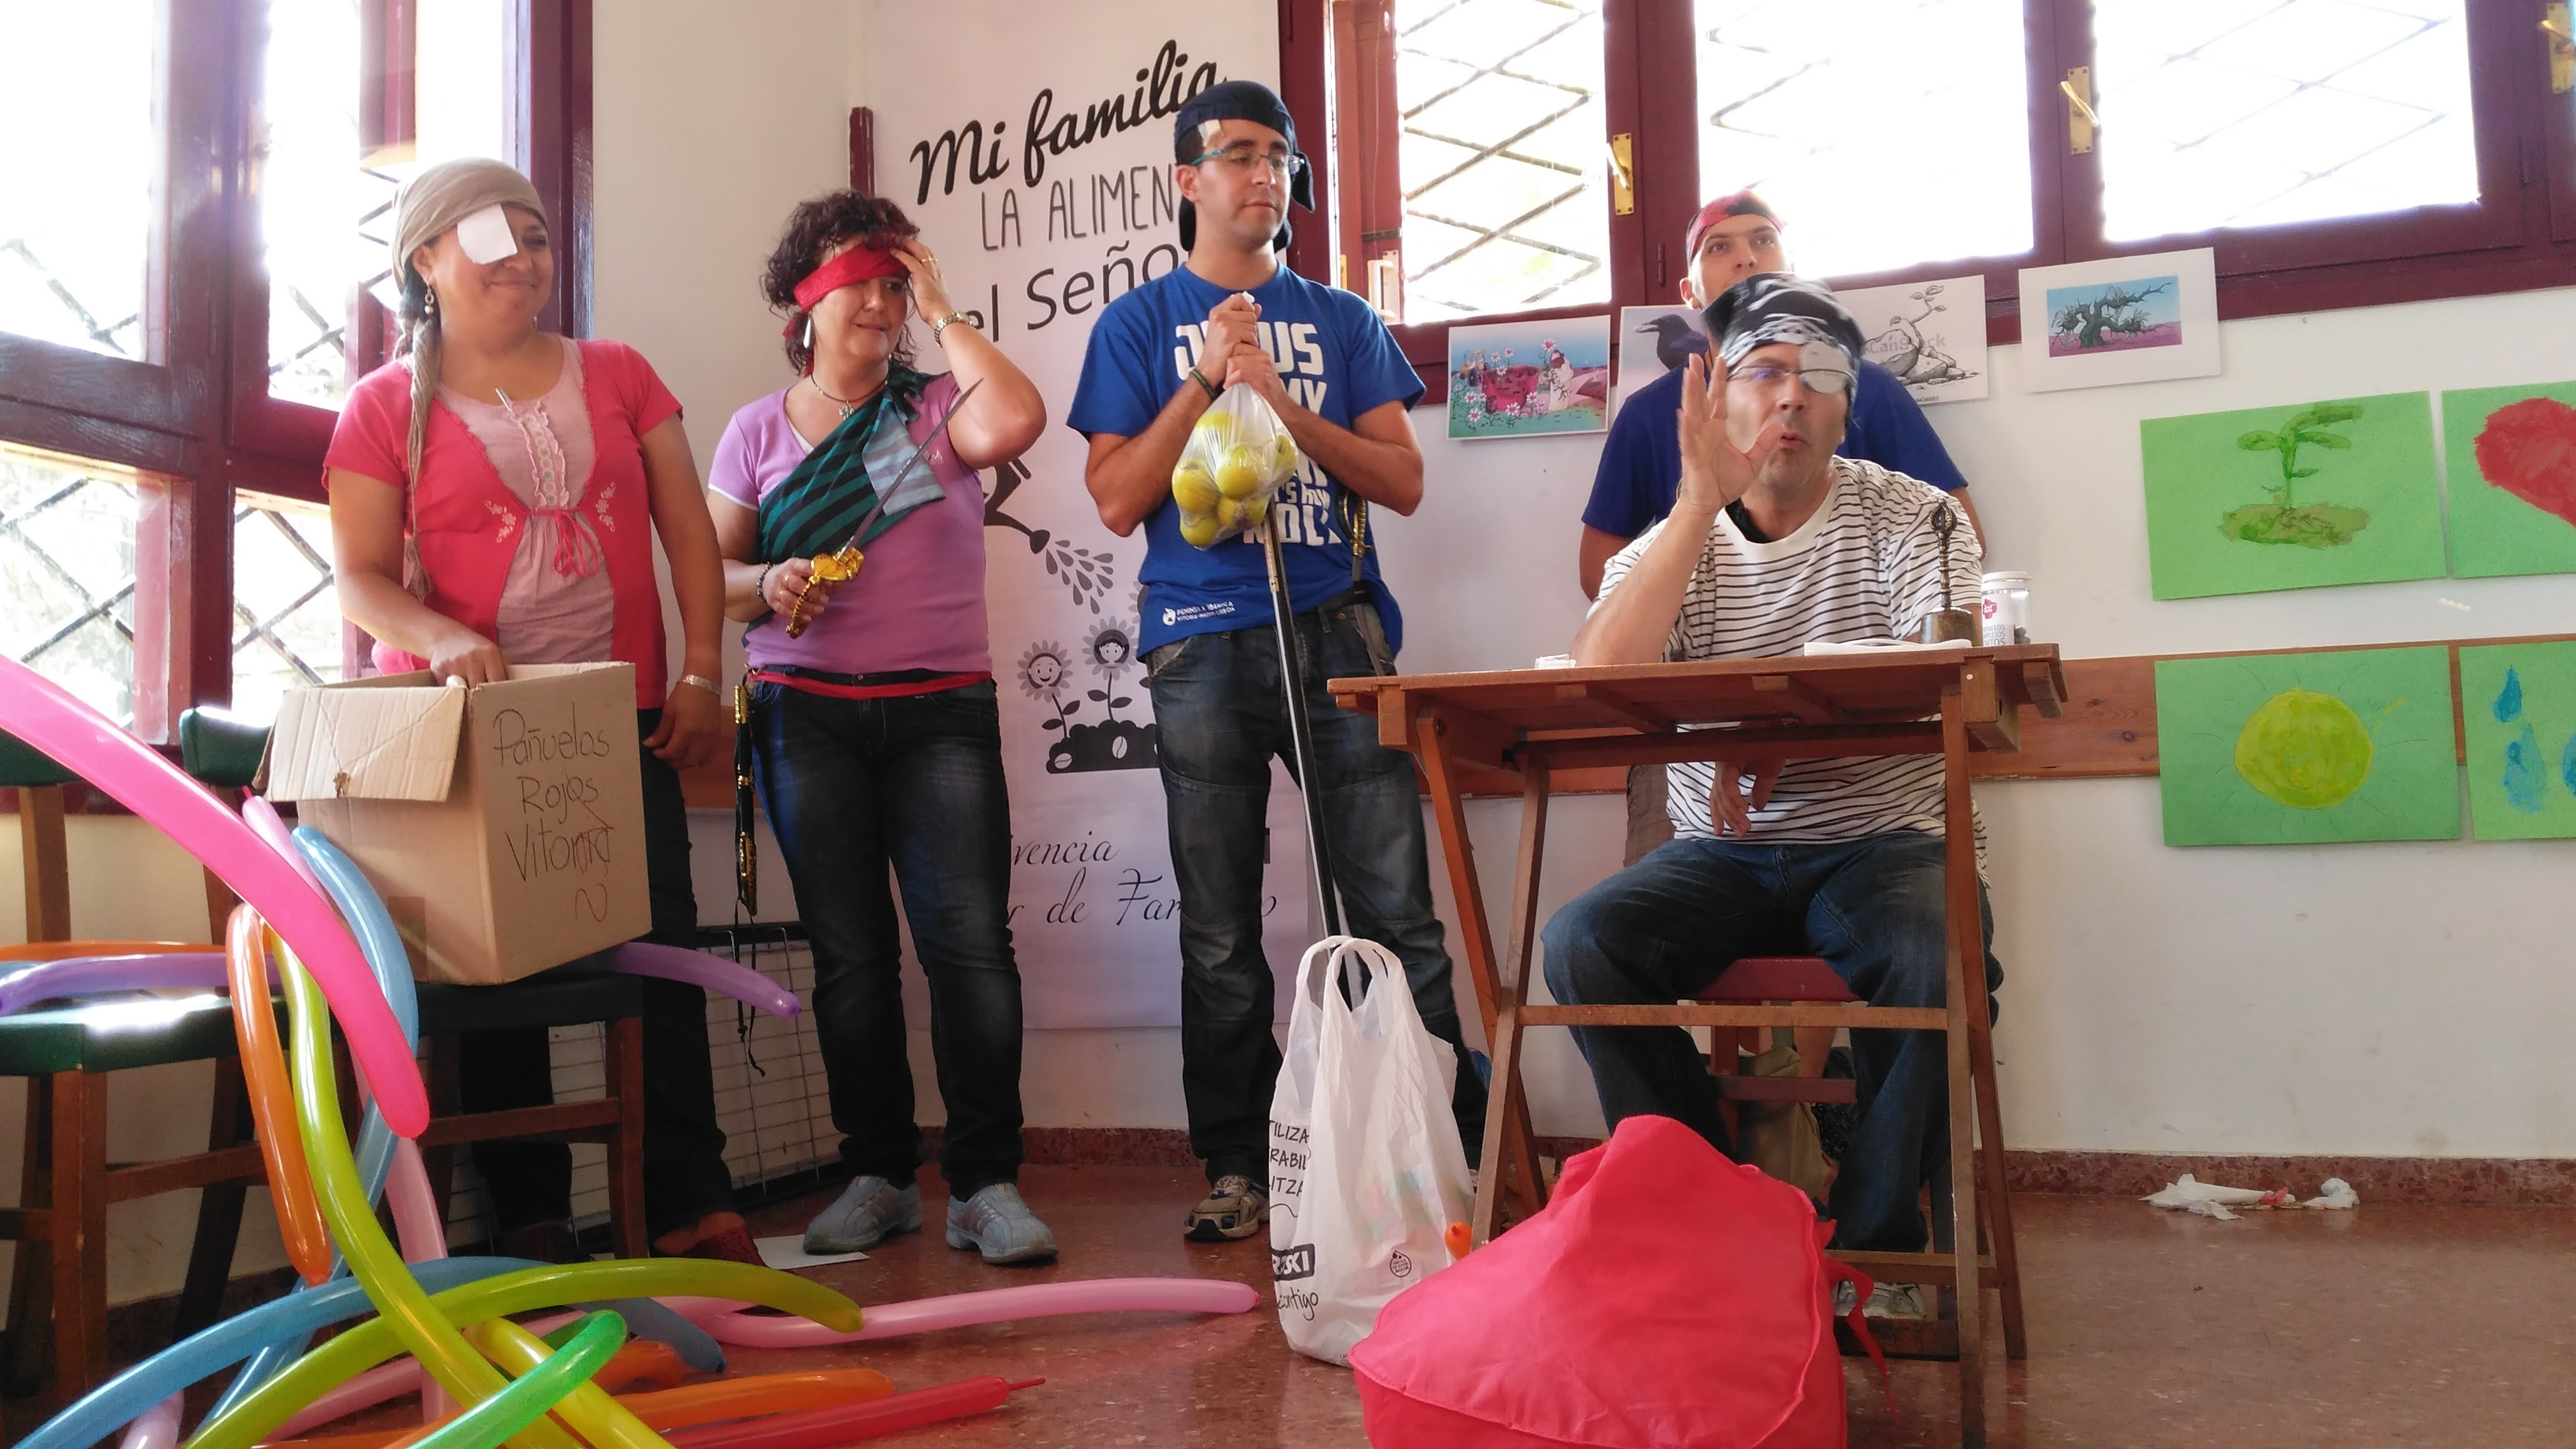 Picasa - 2015.09.12-13 - Convivencia Sector Familias(8).jpg